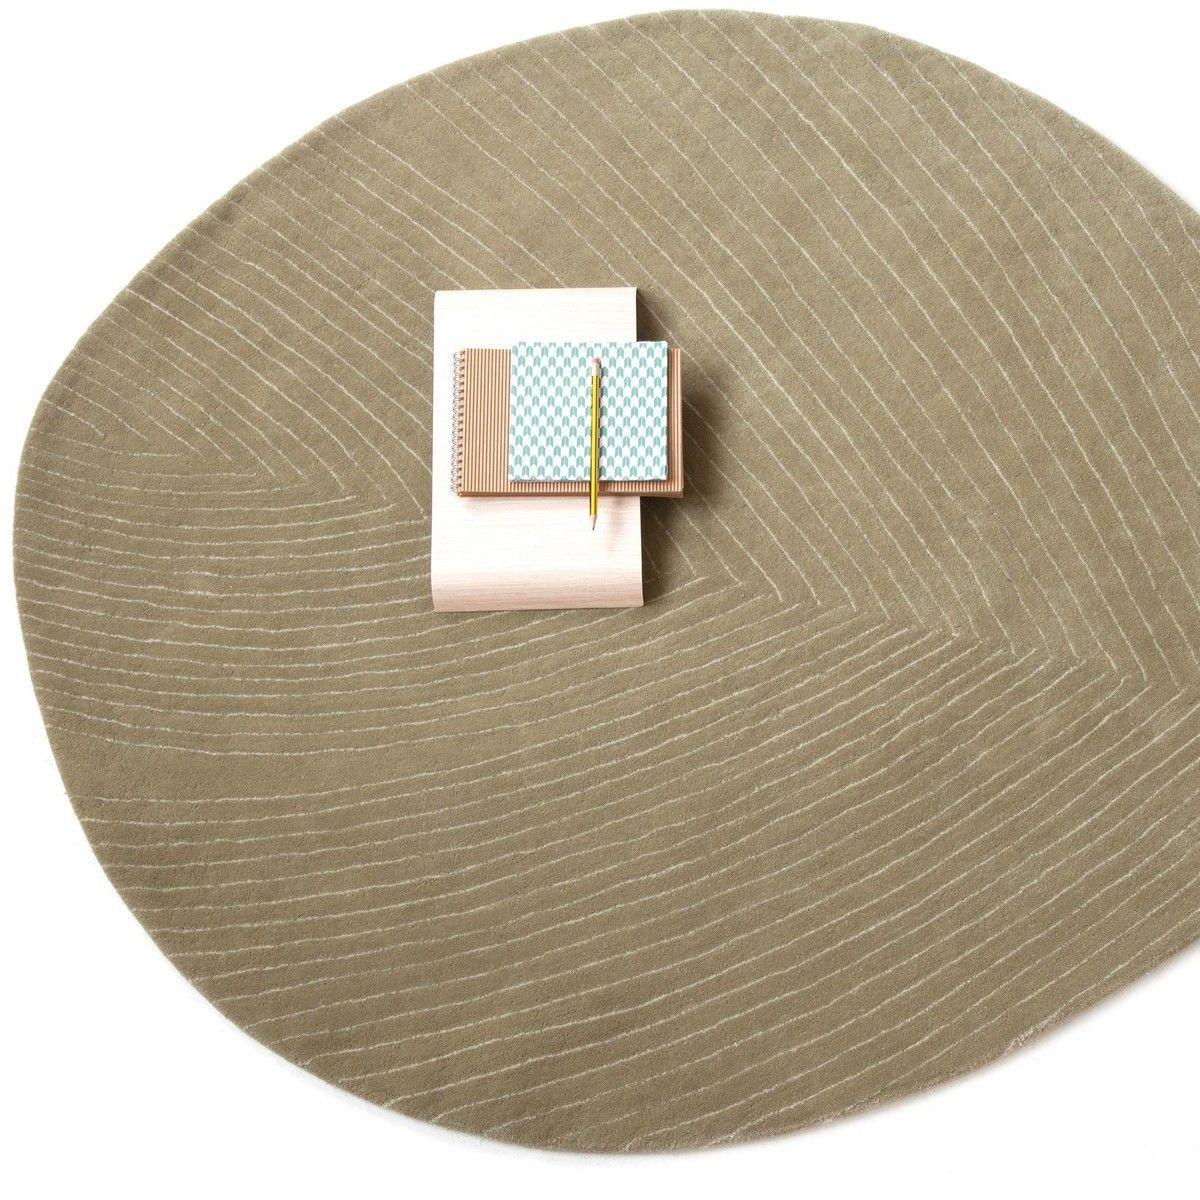 quill tapis en vierge nanimarquina tapis pour couloirs tapis textiles